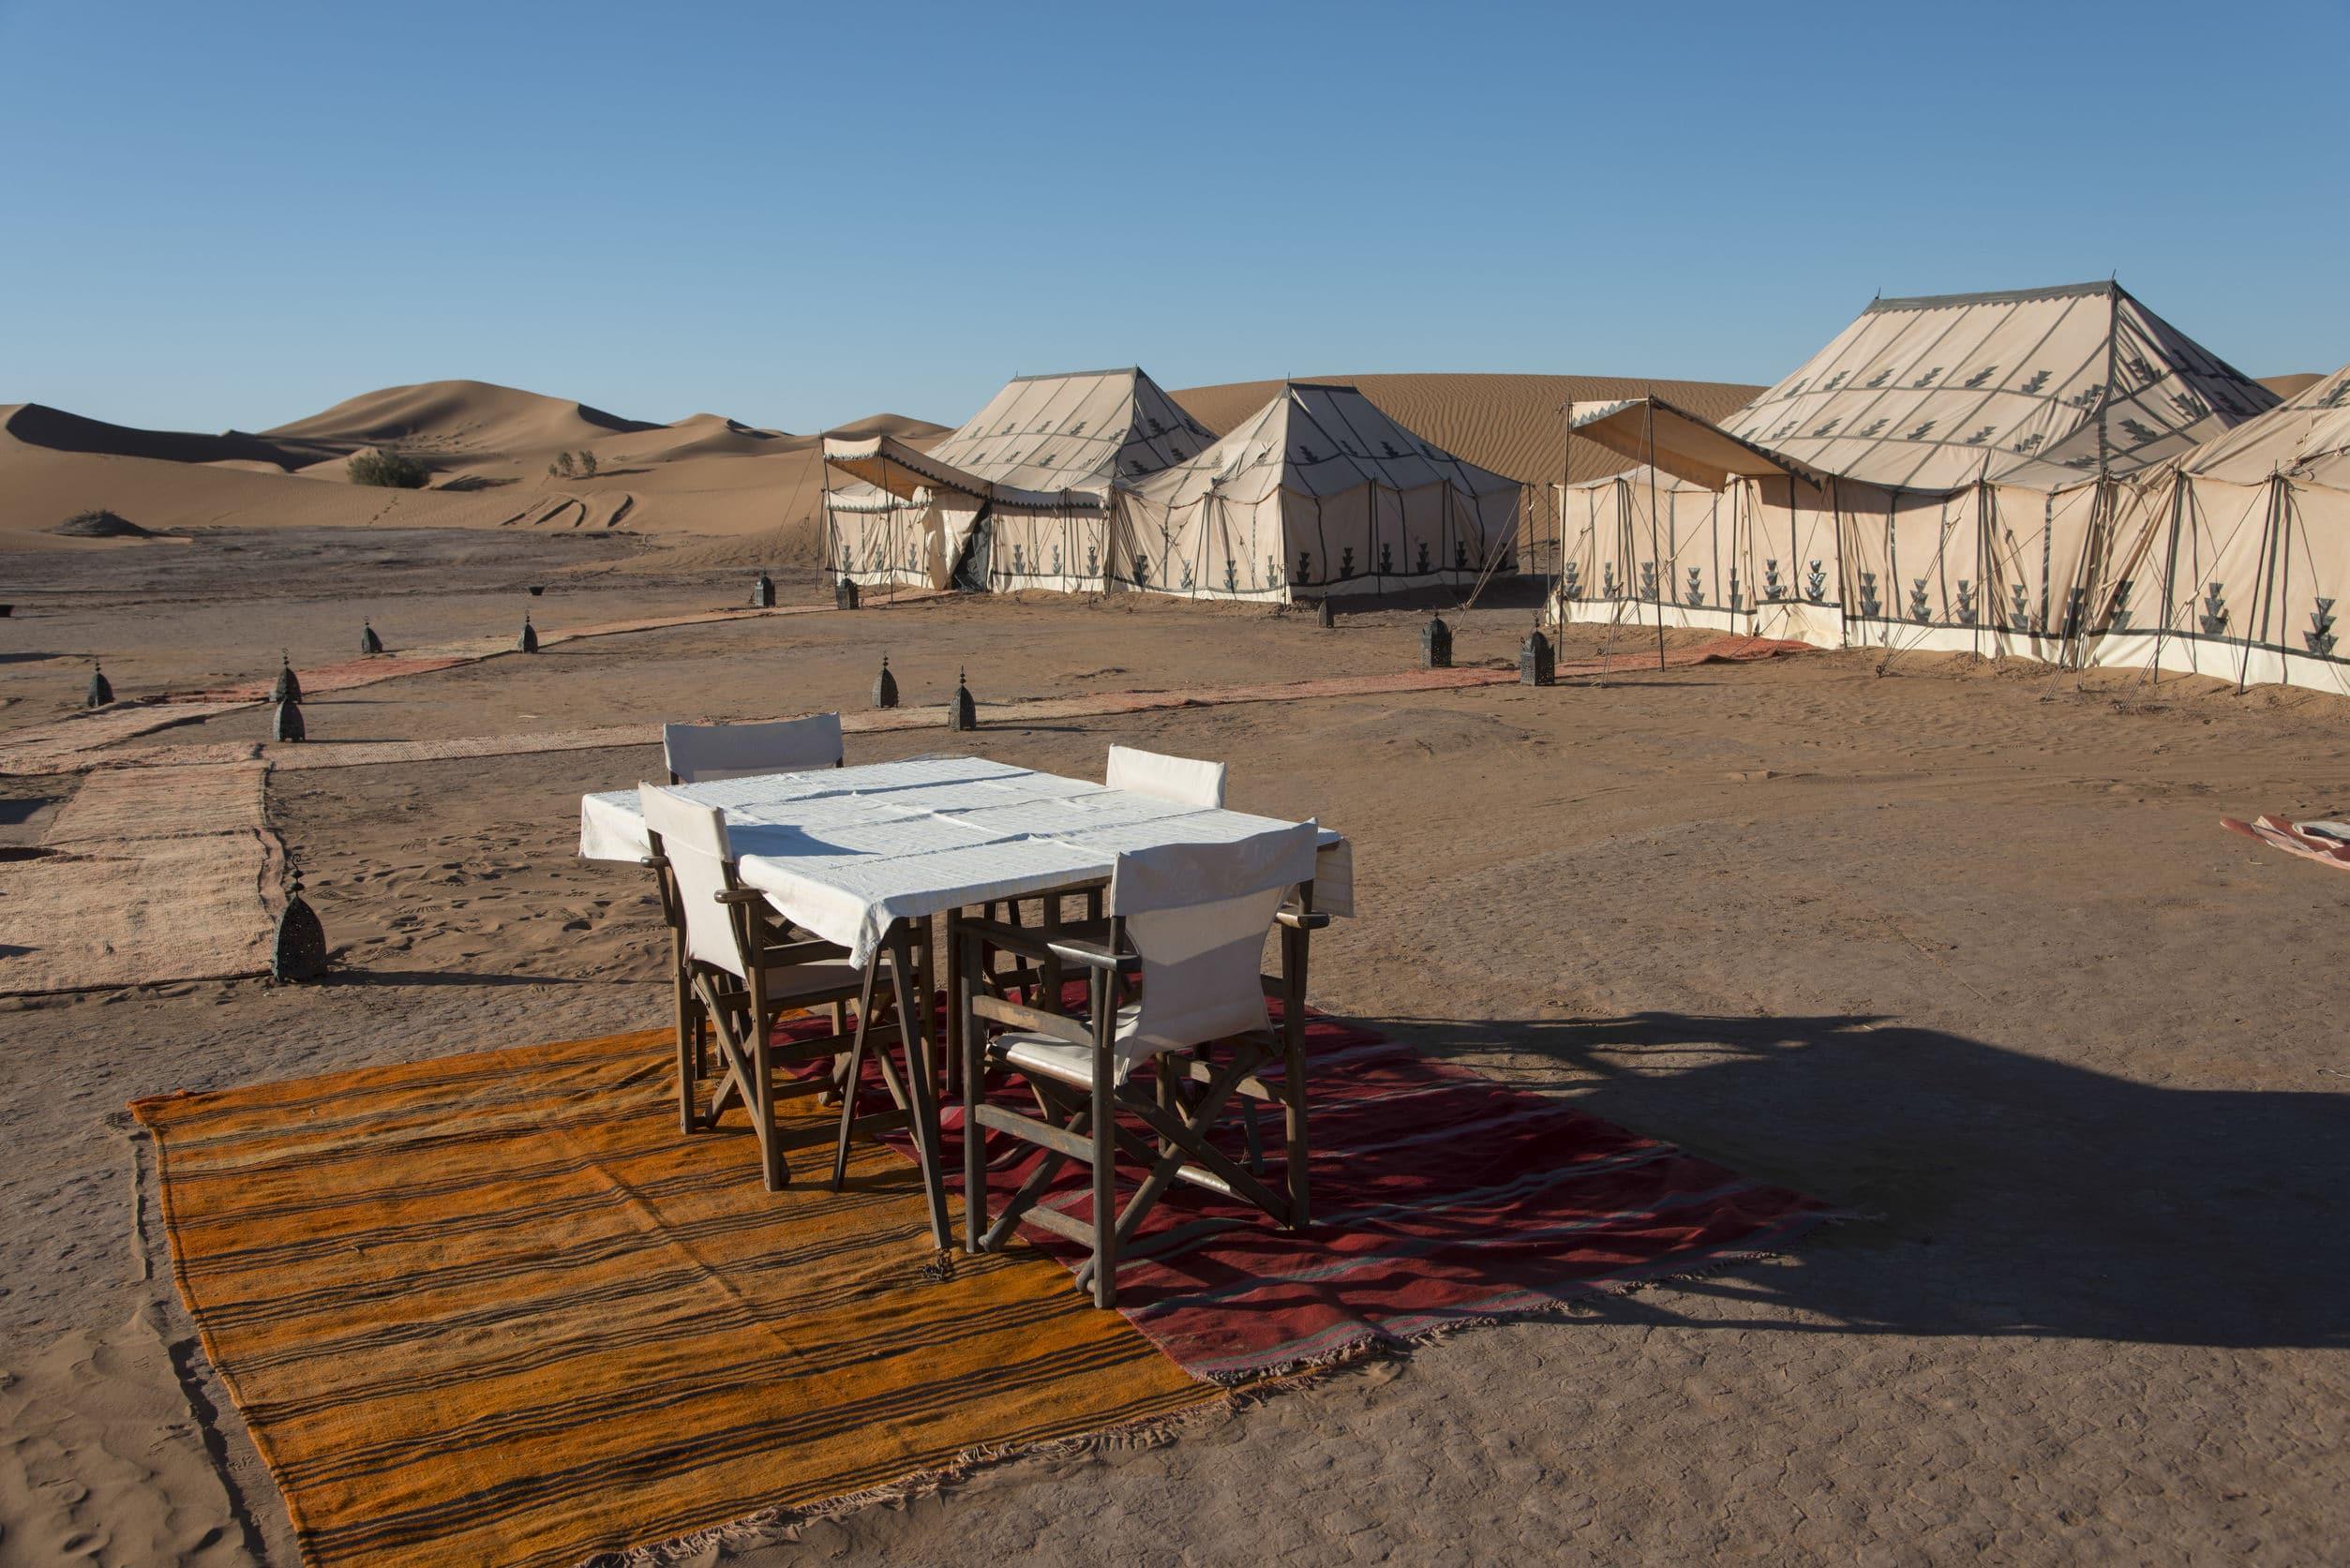 Ruta Marrakech y Desierto de Zagora 3